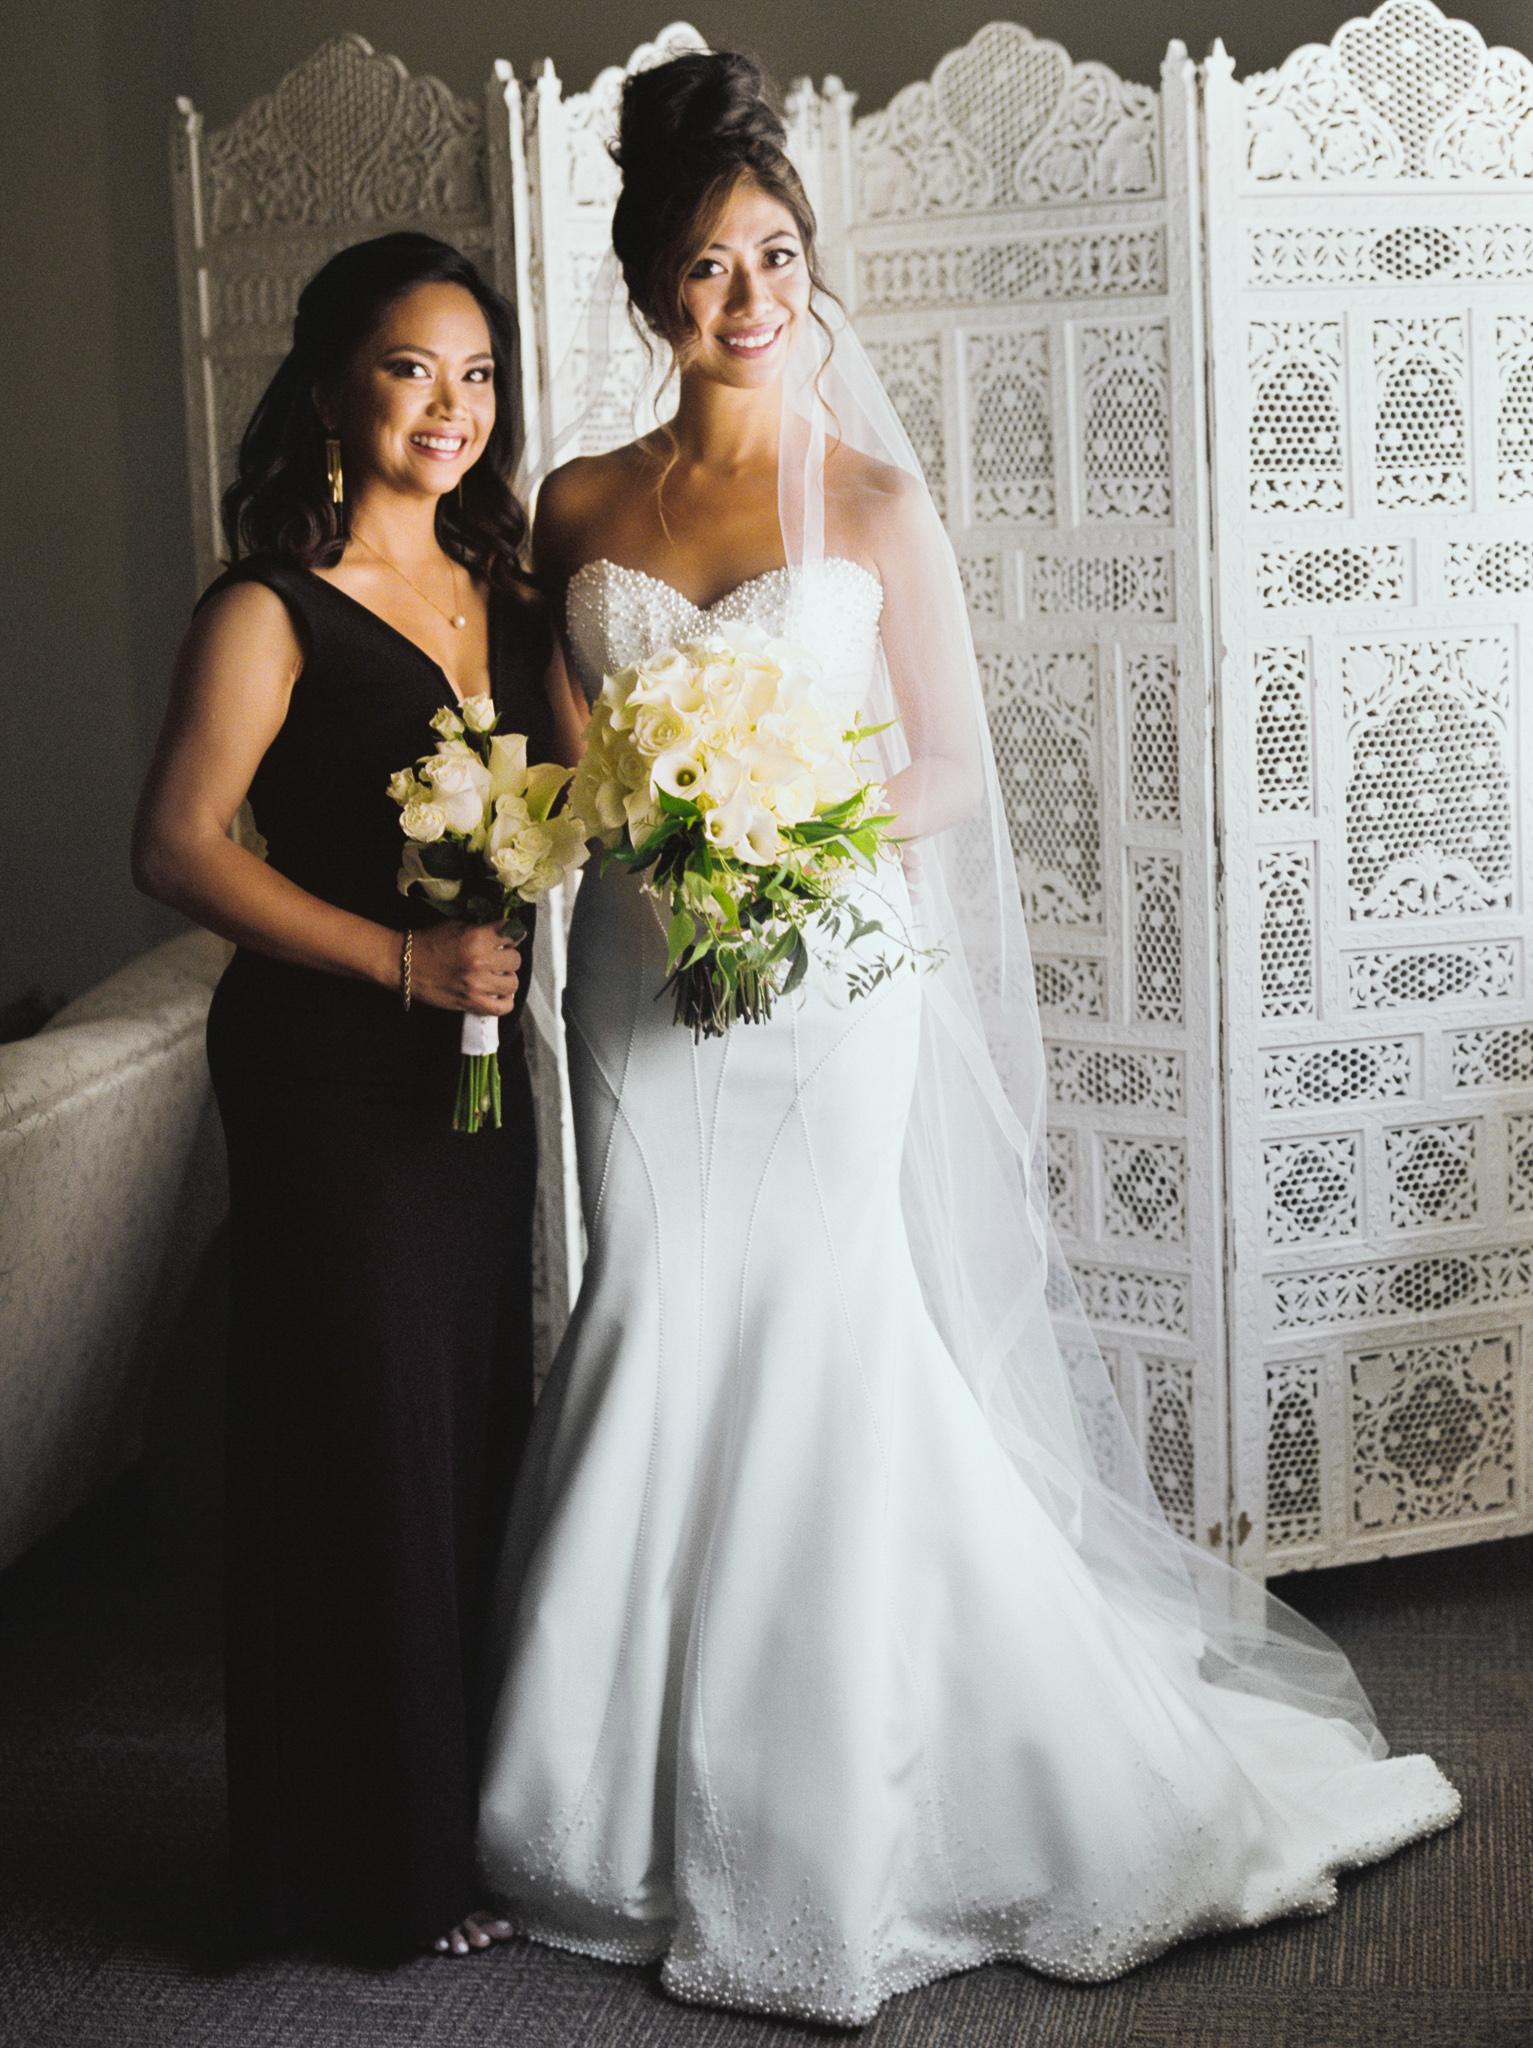 026OutliveCreative_Travel_Photographer_Videographer_Lewis&Clark_Oregon_Elegant_BlackTie_Destination_Wedding.jpg